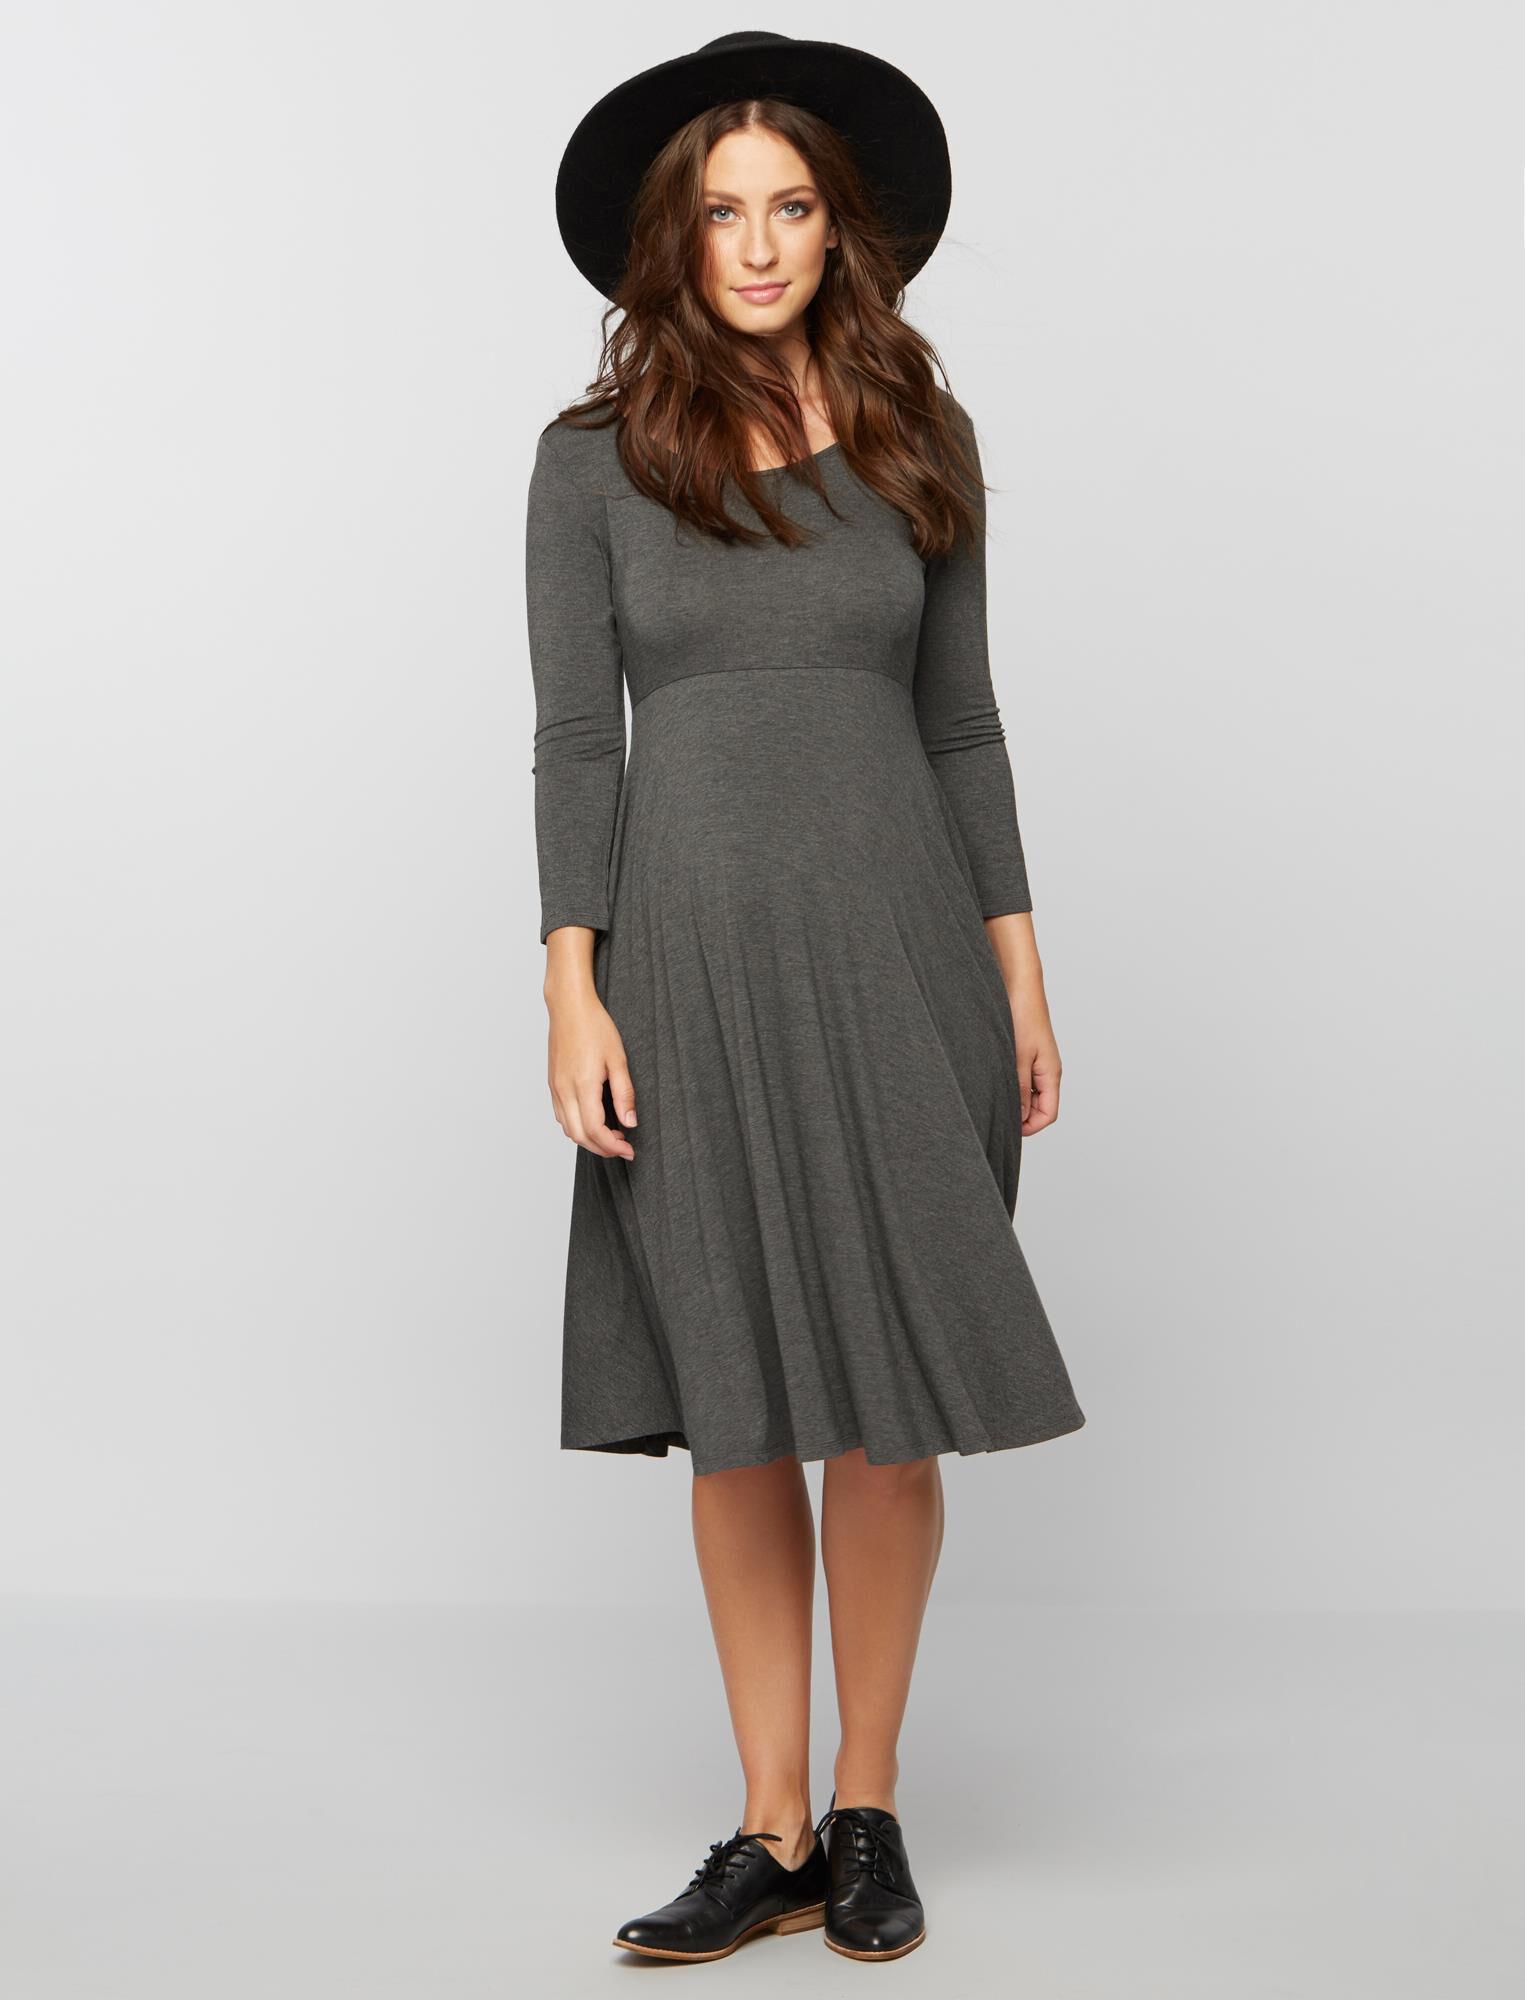 Babydoll Maternity Dress